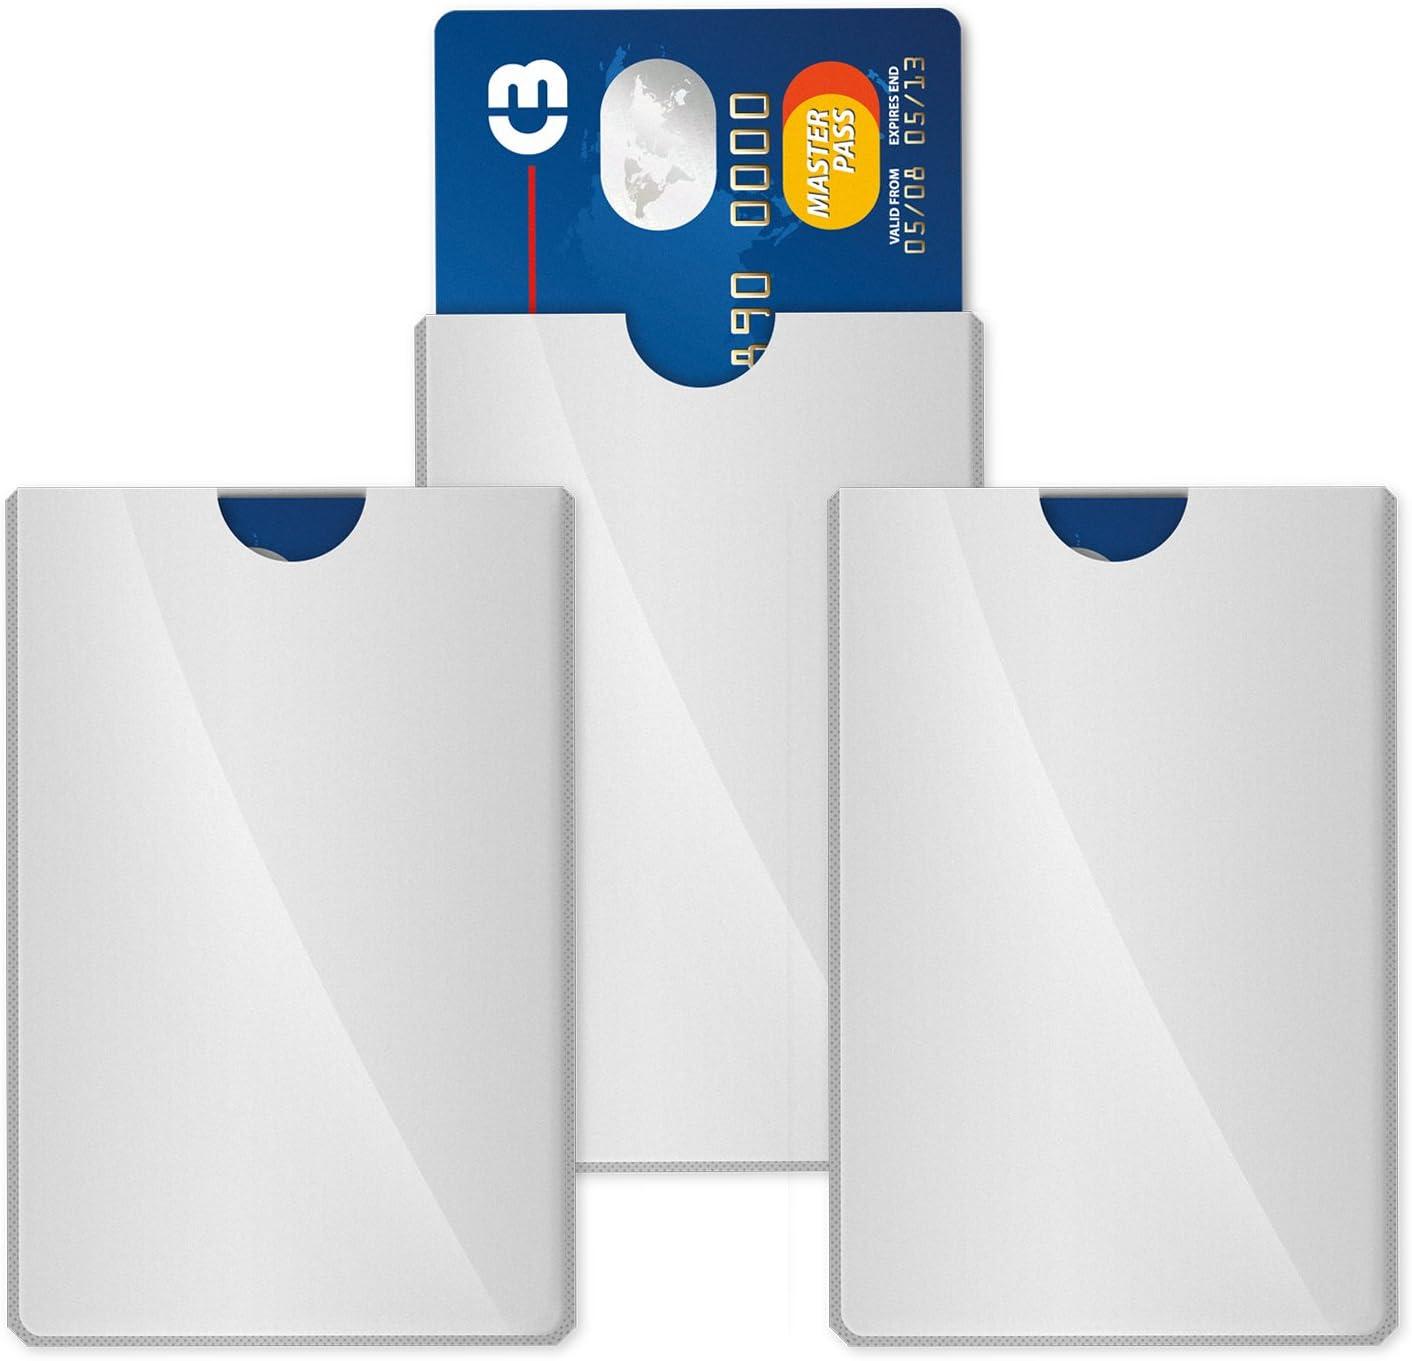 Fibatec 3 Stück Rfid Schutzhülle Nfc Schutzhülle Computer Zubehör